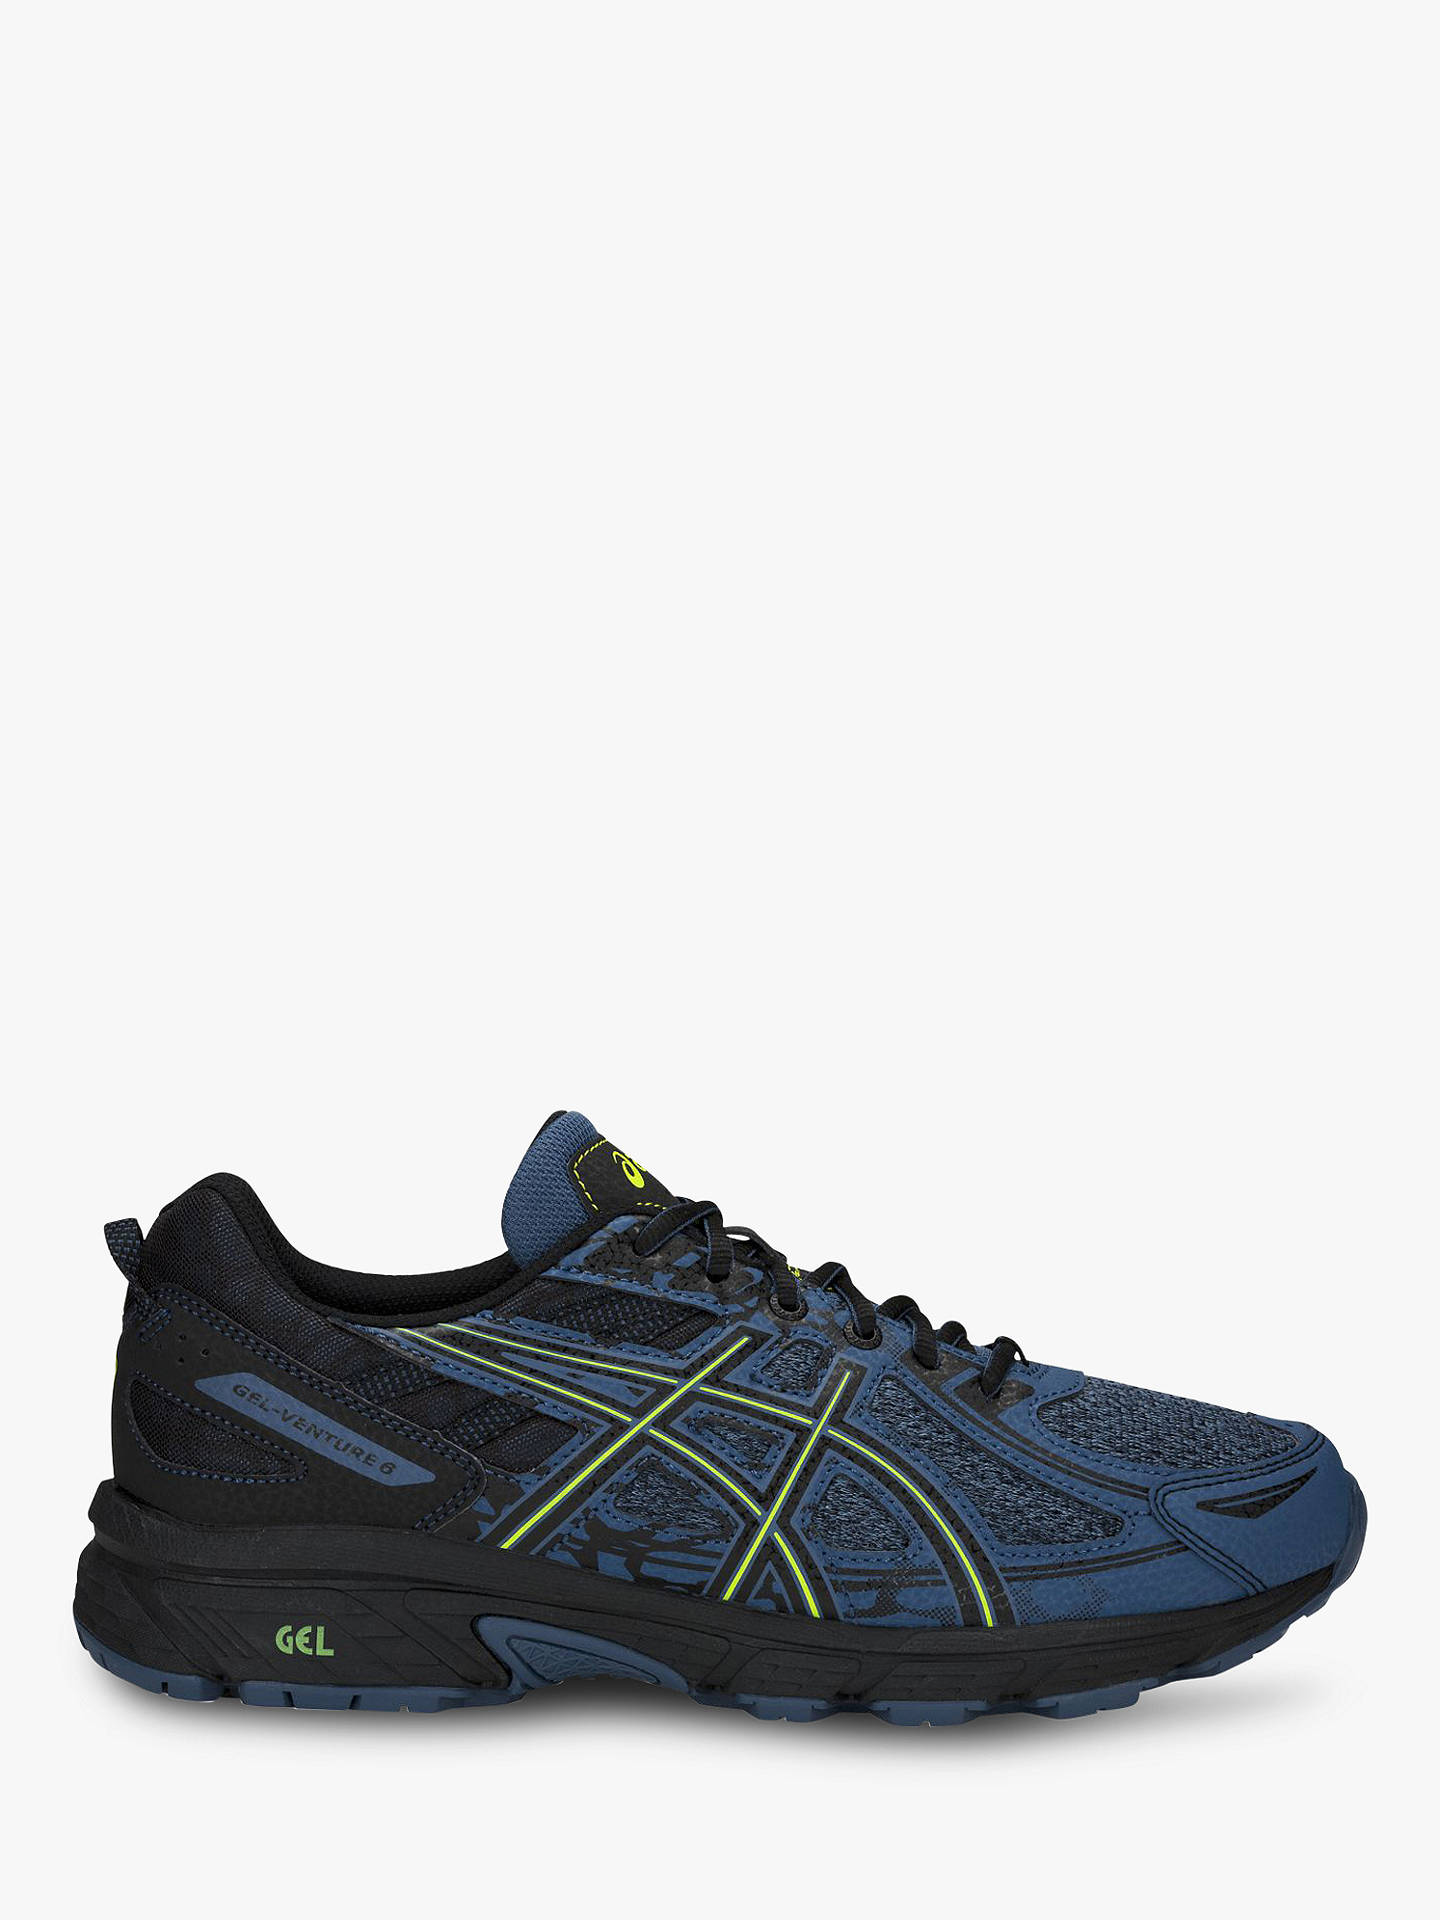 609faf0a4adb Buy ASICS GEL-VENTURE 6 Men s Running Shoes